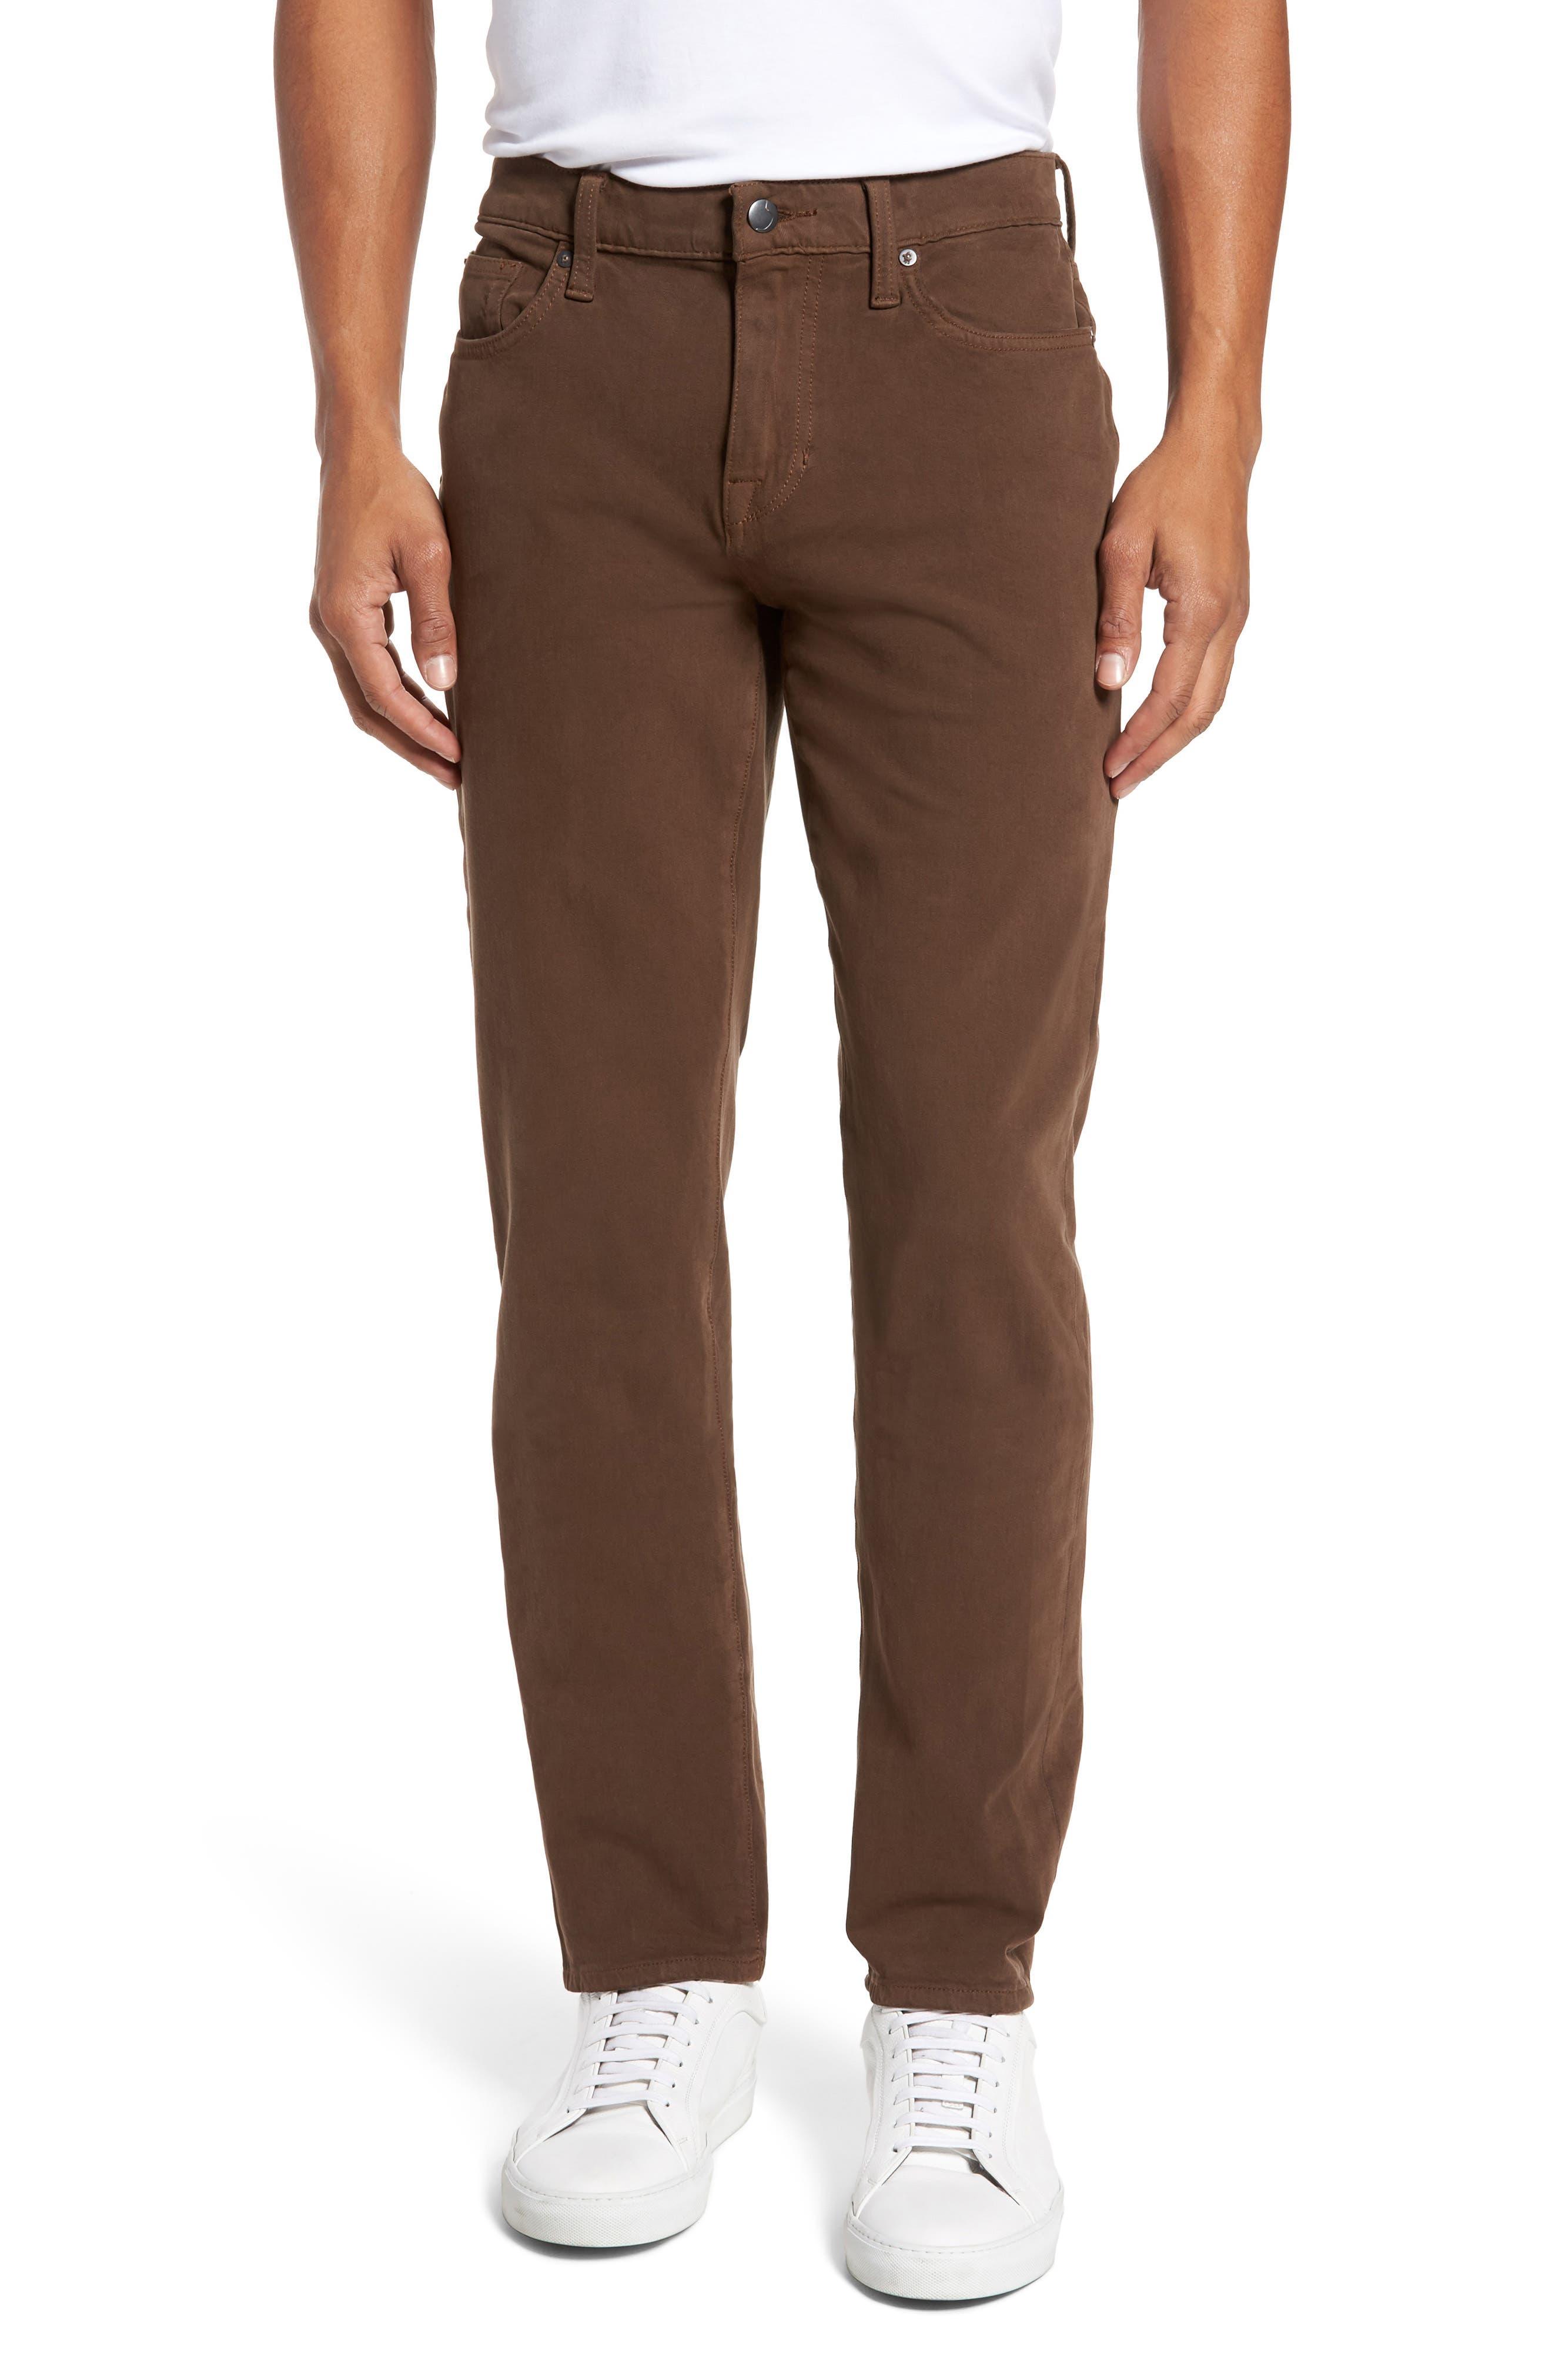 Brixton Slim Straight Fit Jeans,                         Main,                         color, 202